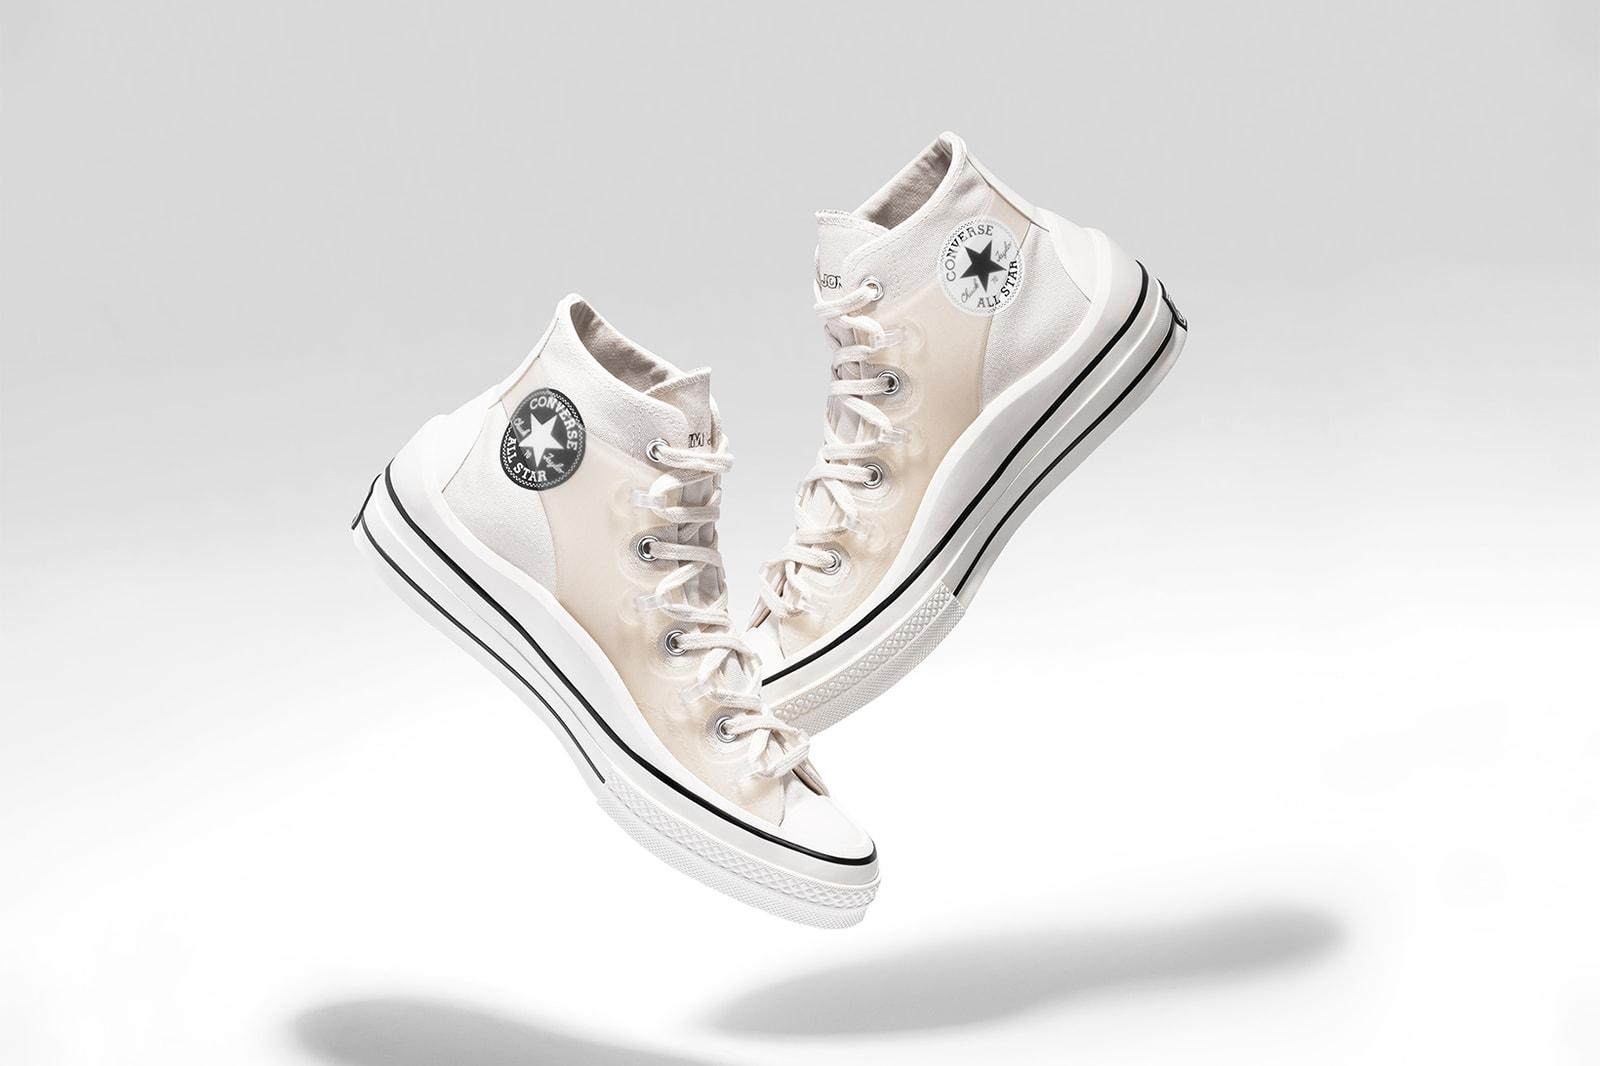 converse kim jones chuck 70 sneakers collaboration tee t shirt pants cream white